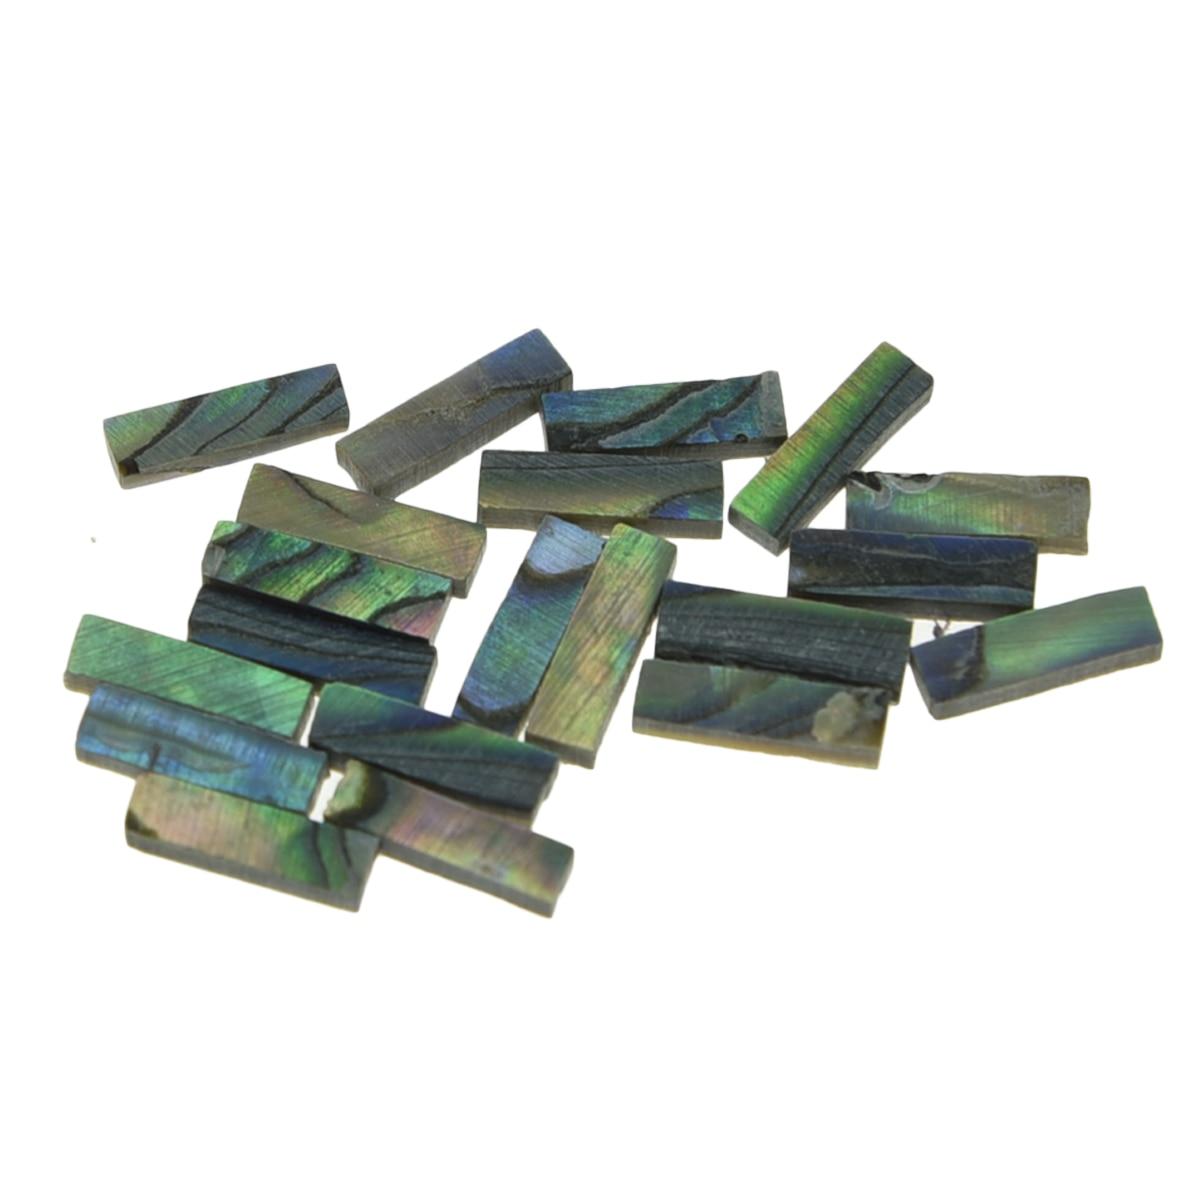 20x Dopro Real New Zealand Abalone Shell Binding Inlay Purfling Strips for Guitar Mandolin Ukulele Marker 7mm*2mm*1.5mm